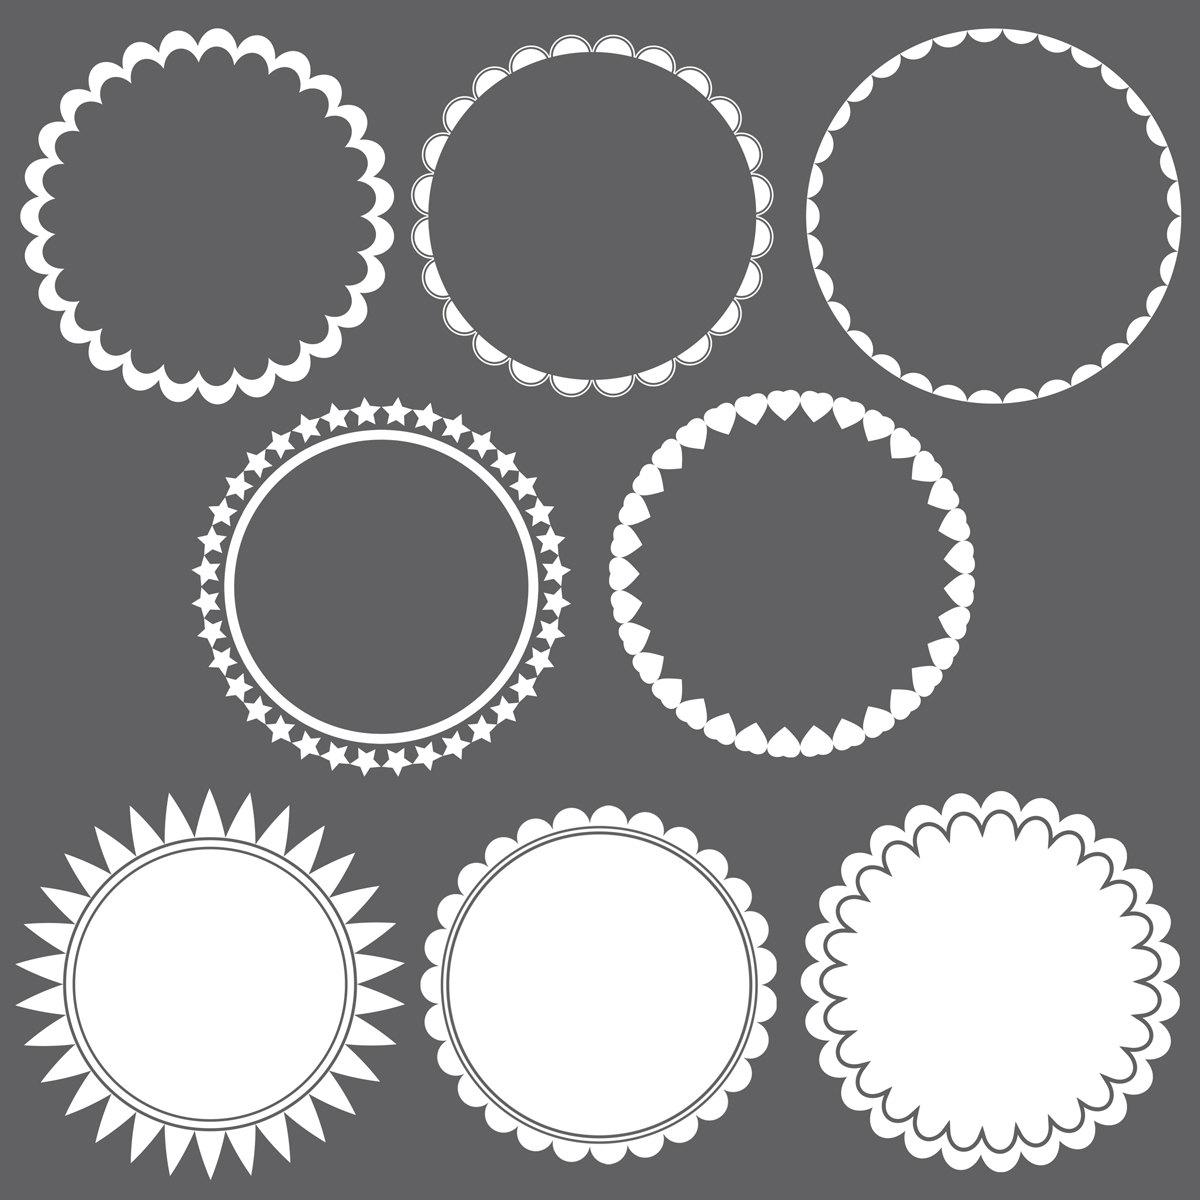 Frame clipart round Digital Promo Frame frames Circle